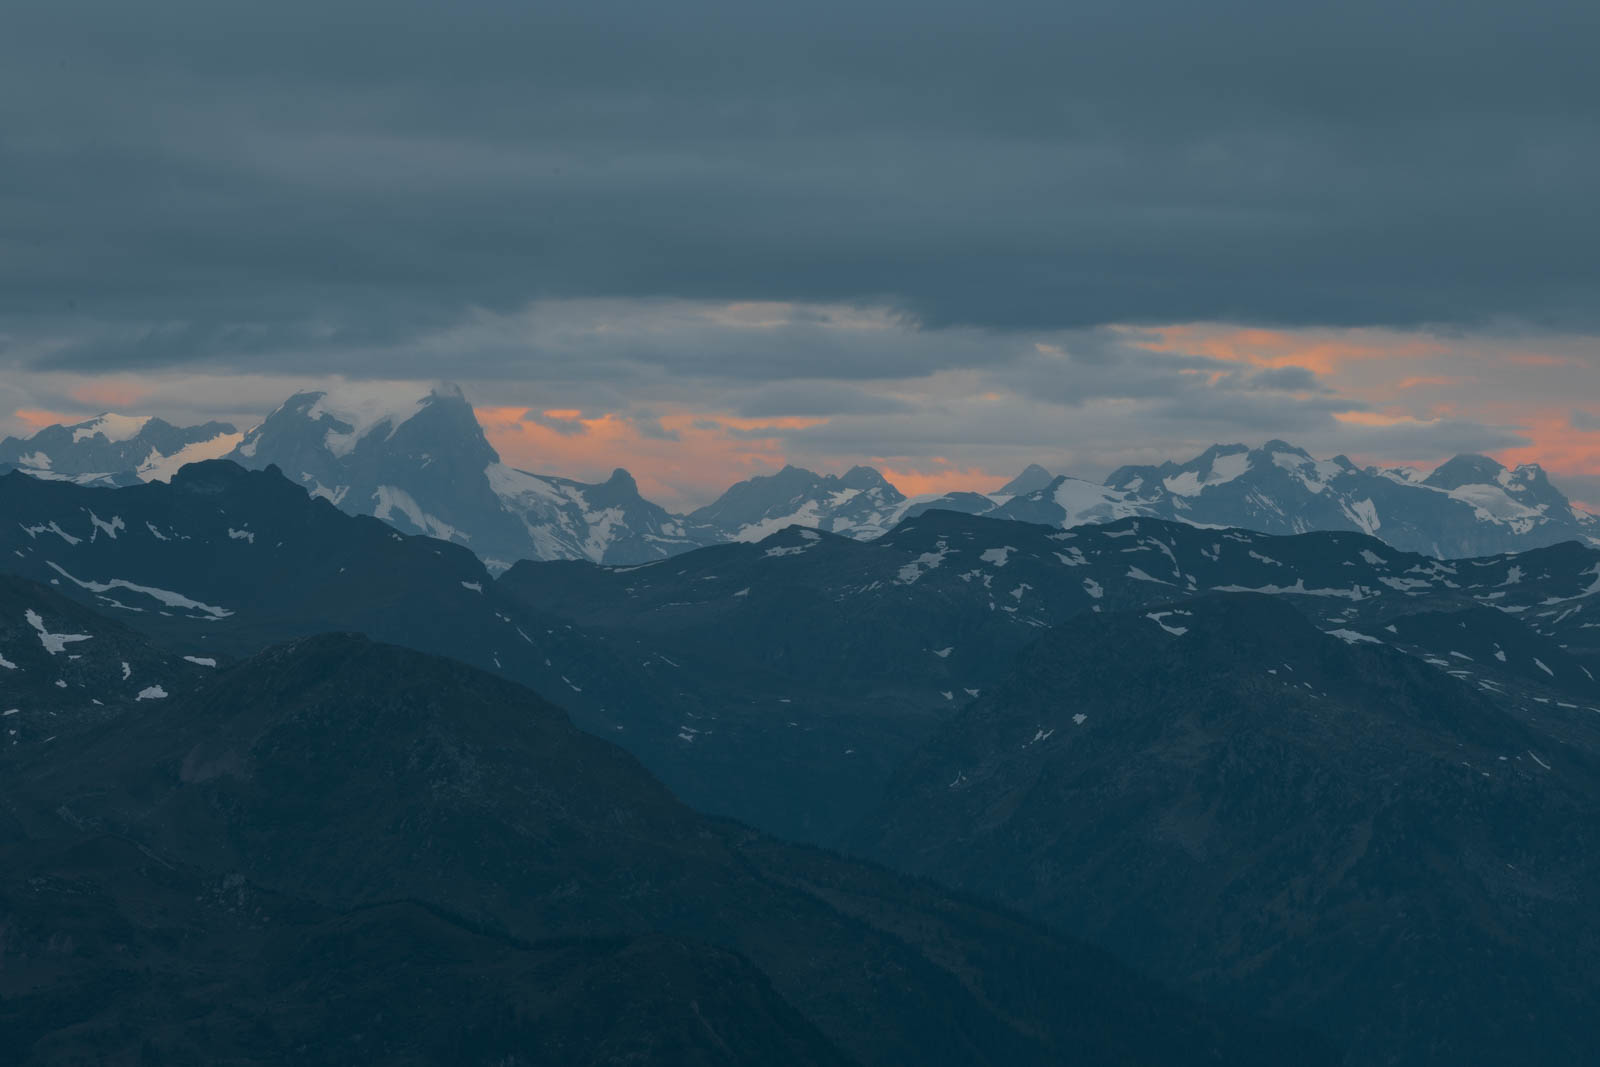 Morgenrot in den Glarner Alpen, Schweiz